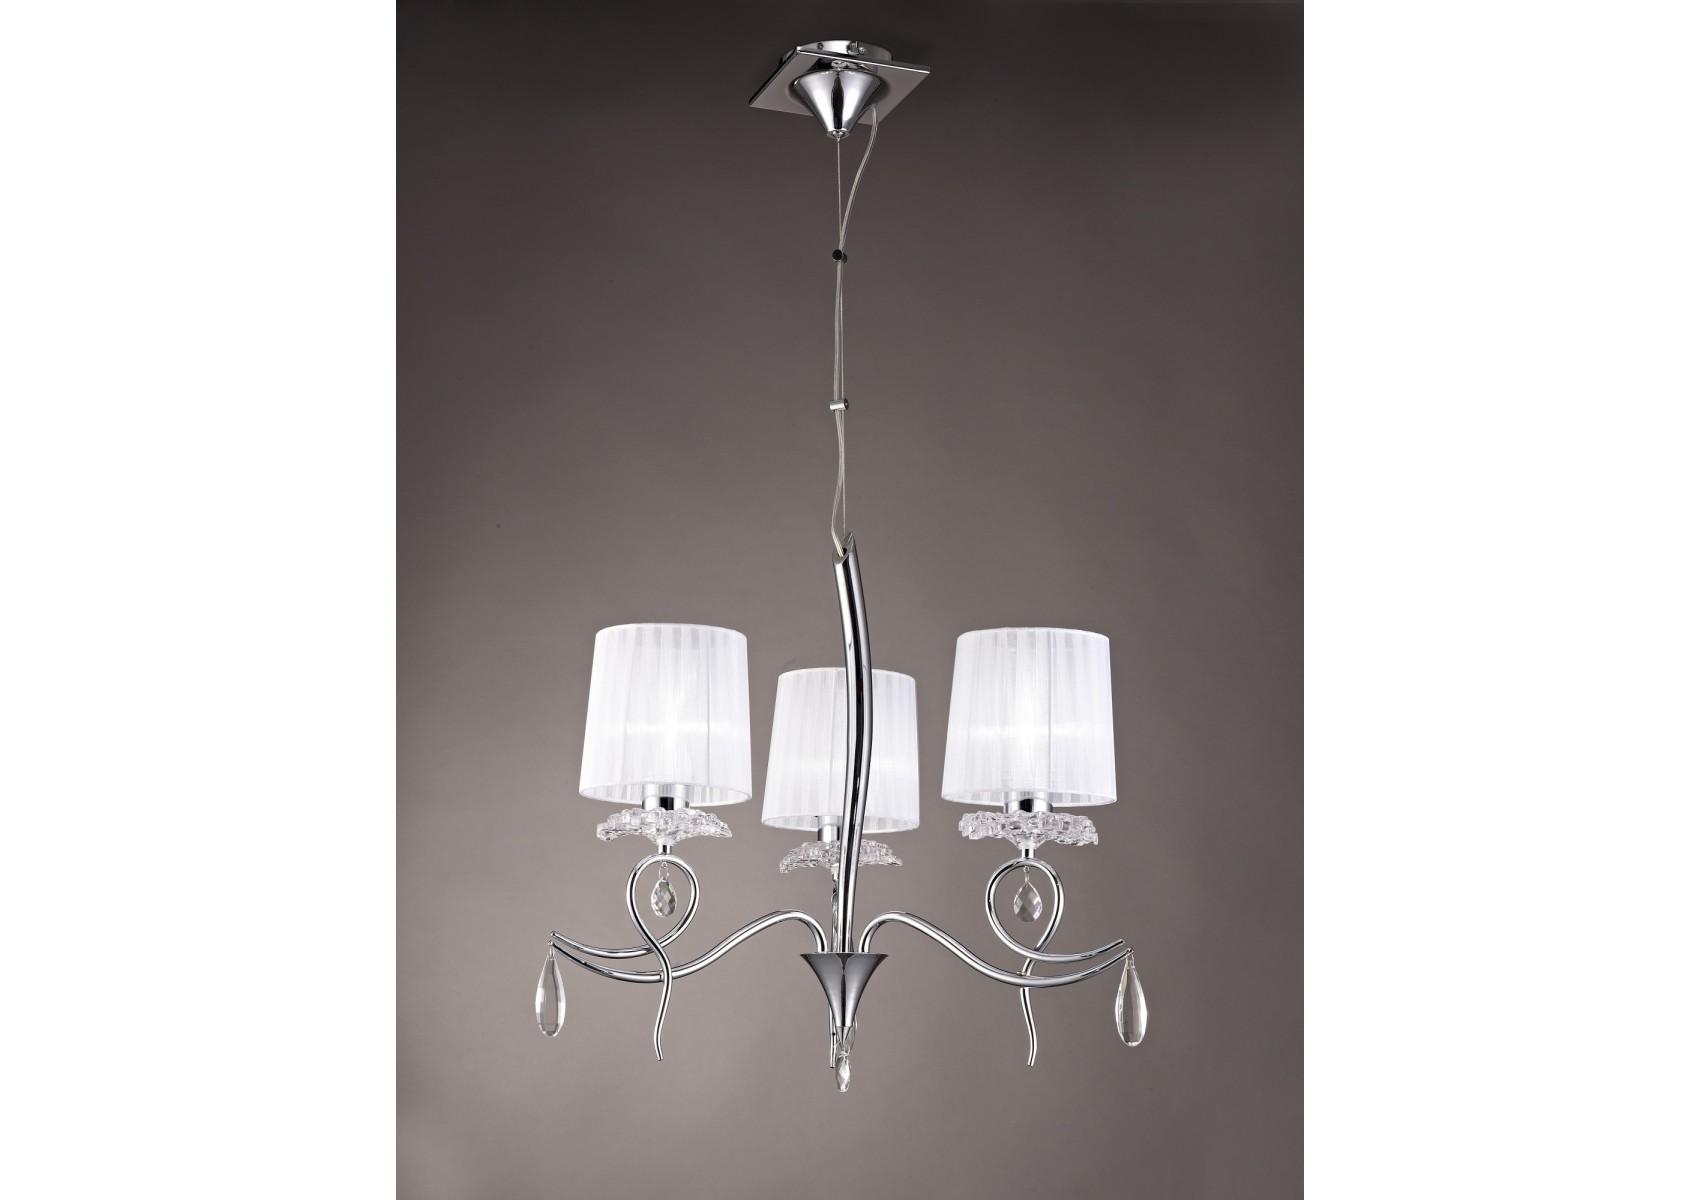 suspension baroque 3 lampes louise boite design. Black Bedroom Furniture Sets. Home Design Ideas